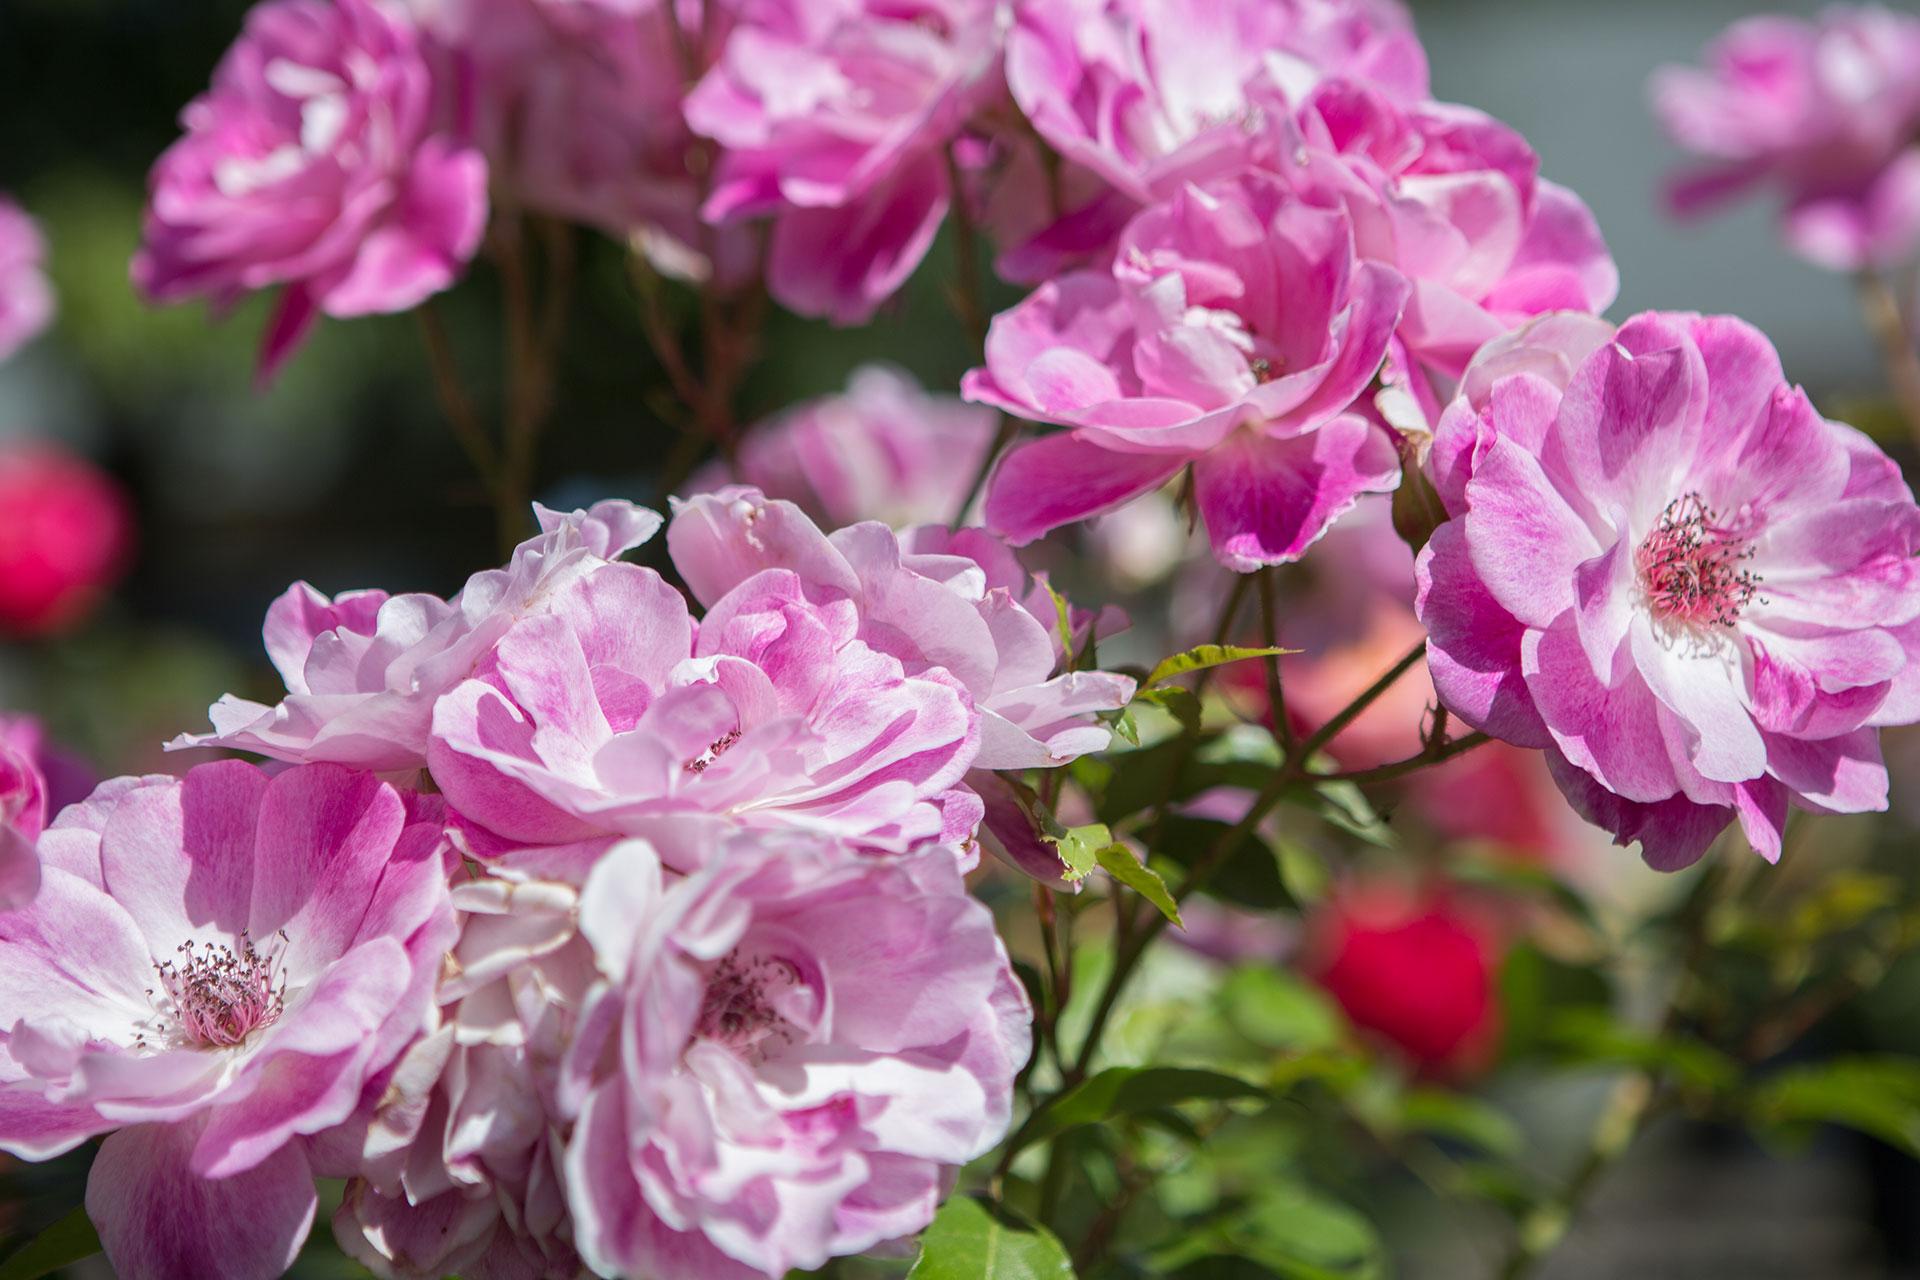 rose-garden-university-park-image3